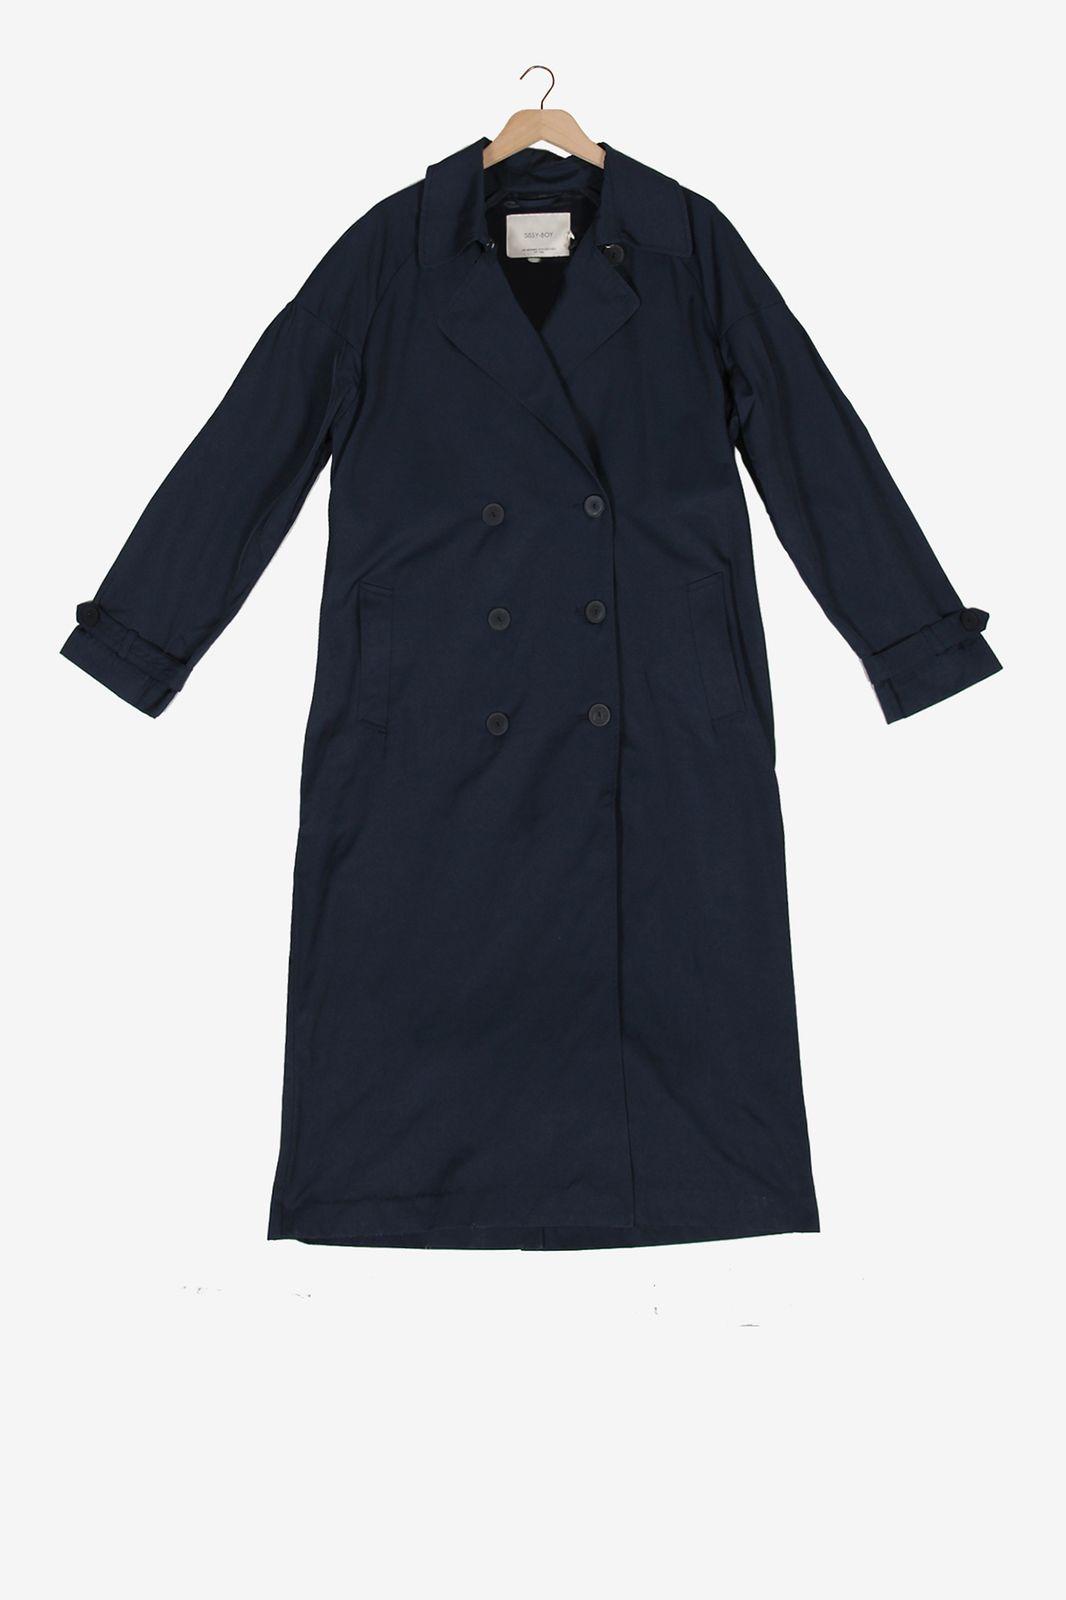 Donkerblauwe trenchcoat